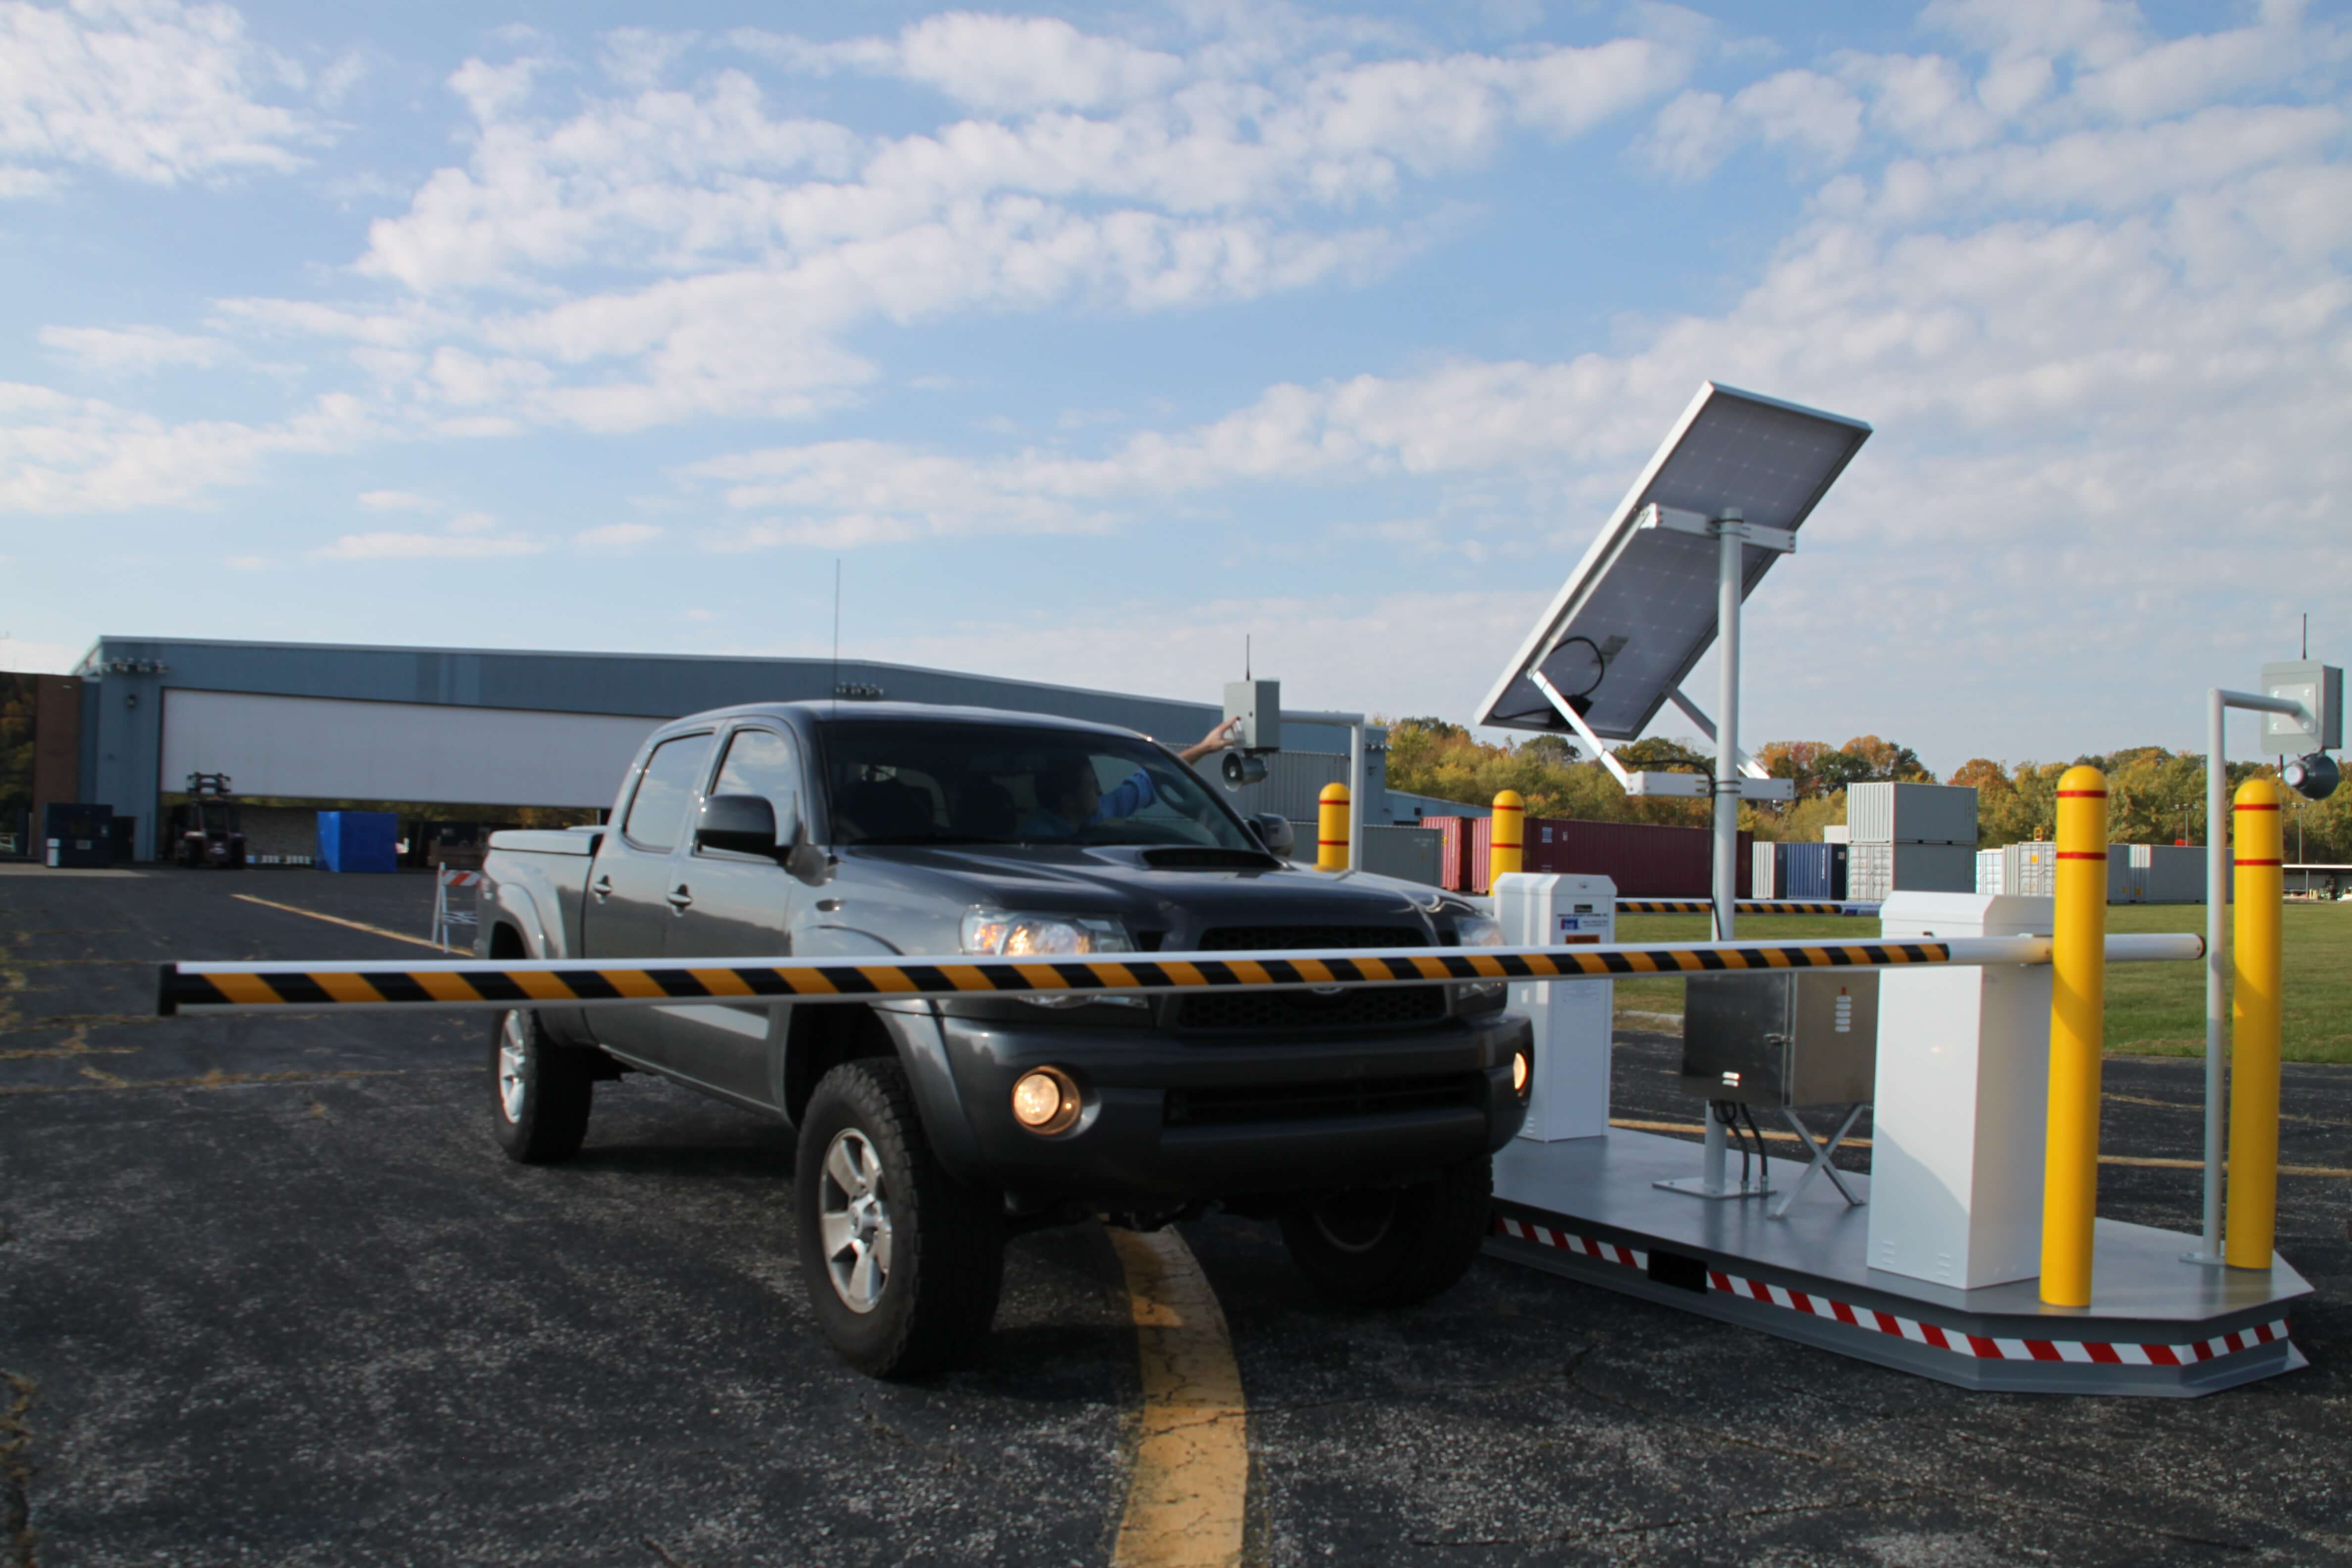 VAC Solar, Solar Power Vehicle Gate, Vehicle gate with solar power